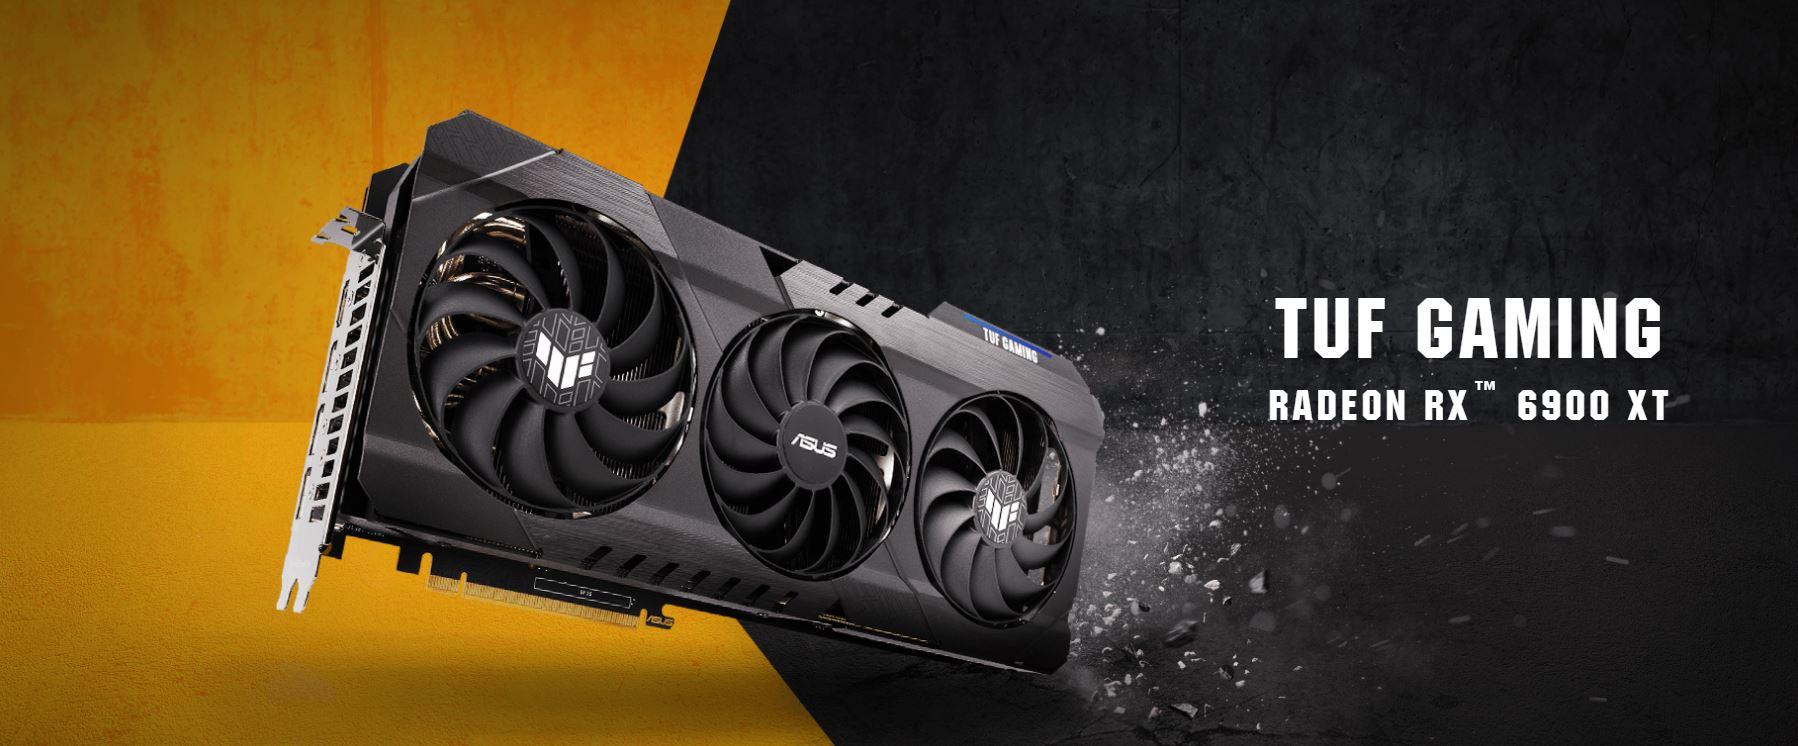 ASUS Meluncurkan Radeon RX 6900 XT TUF GAMING OC, custom RX 6900 XT graphics card Pertama